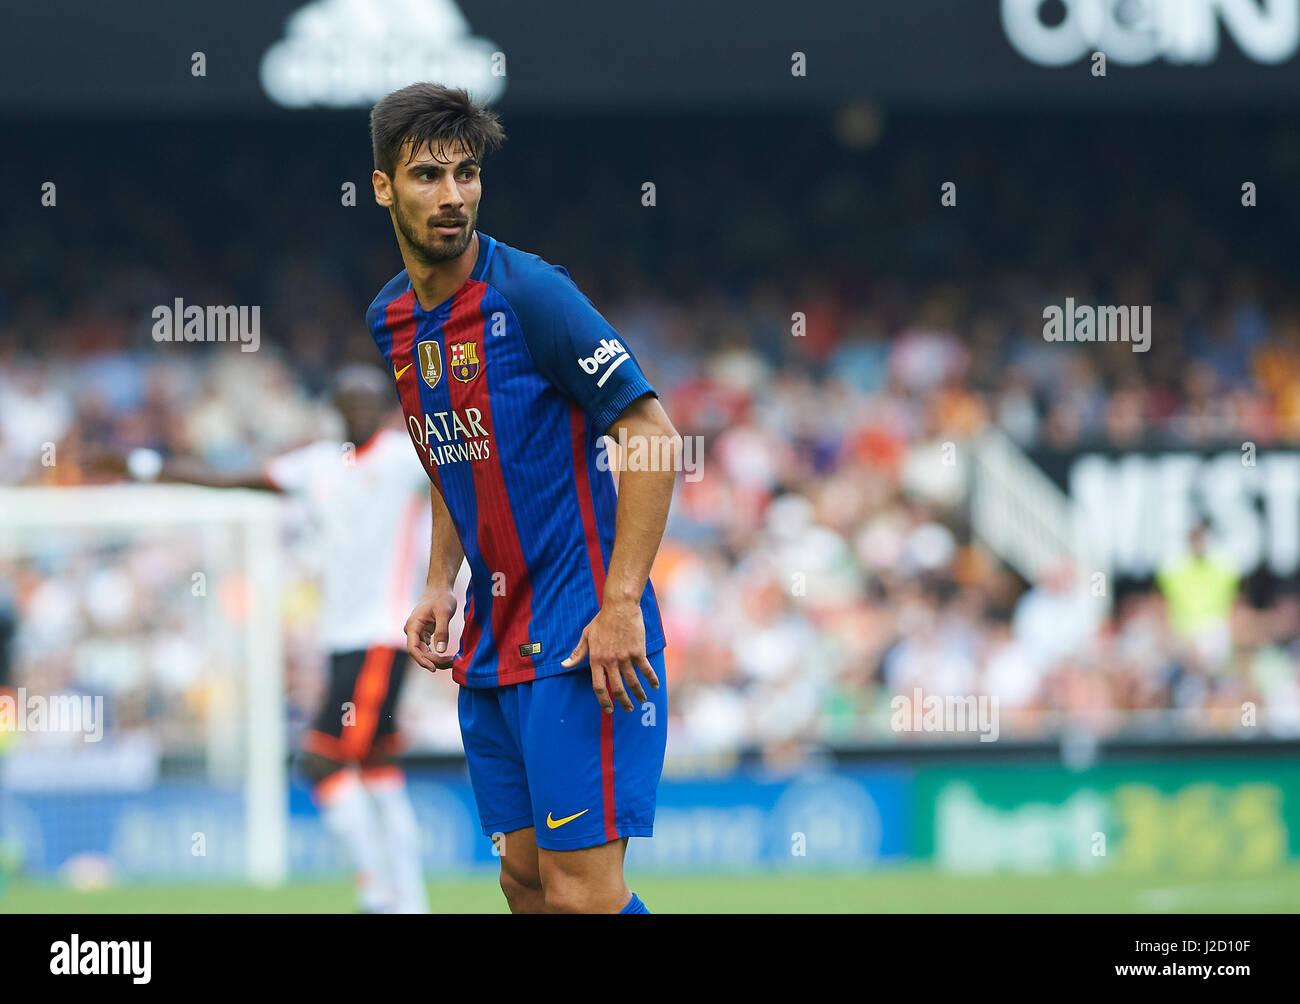 Andre Gomes of FC Barcelona during the La Liga match at Mestalla, Valencia Picture by Maria Jose Segovia/Focus Images - Stock Image